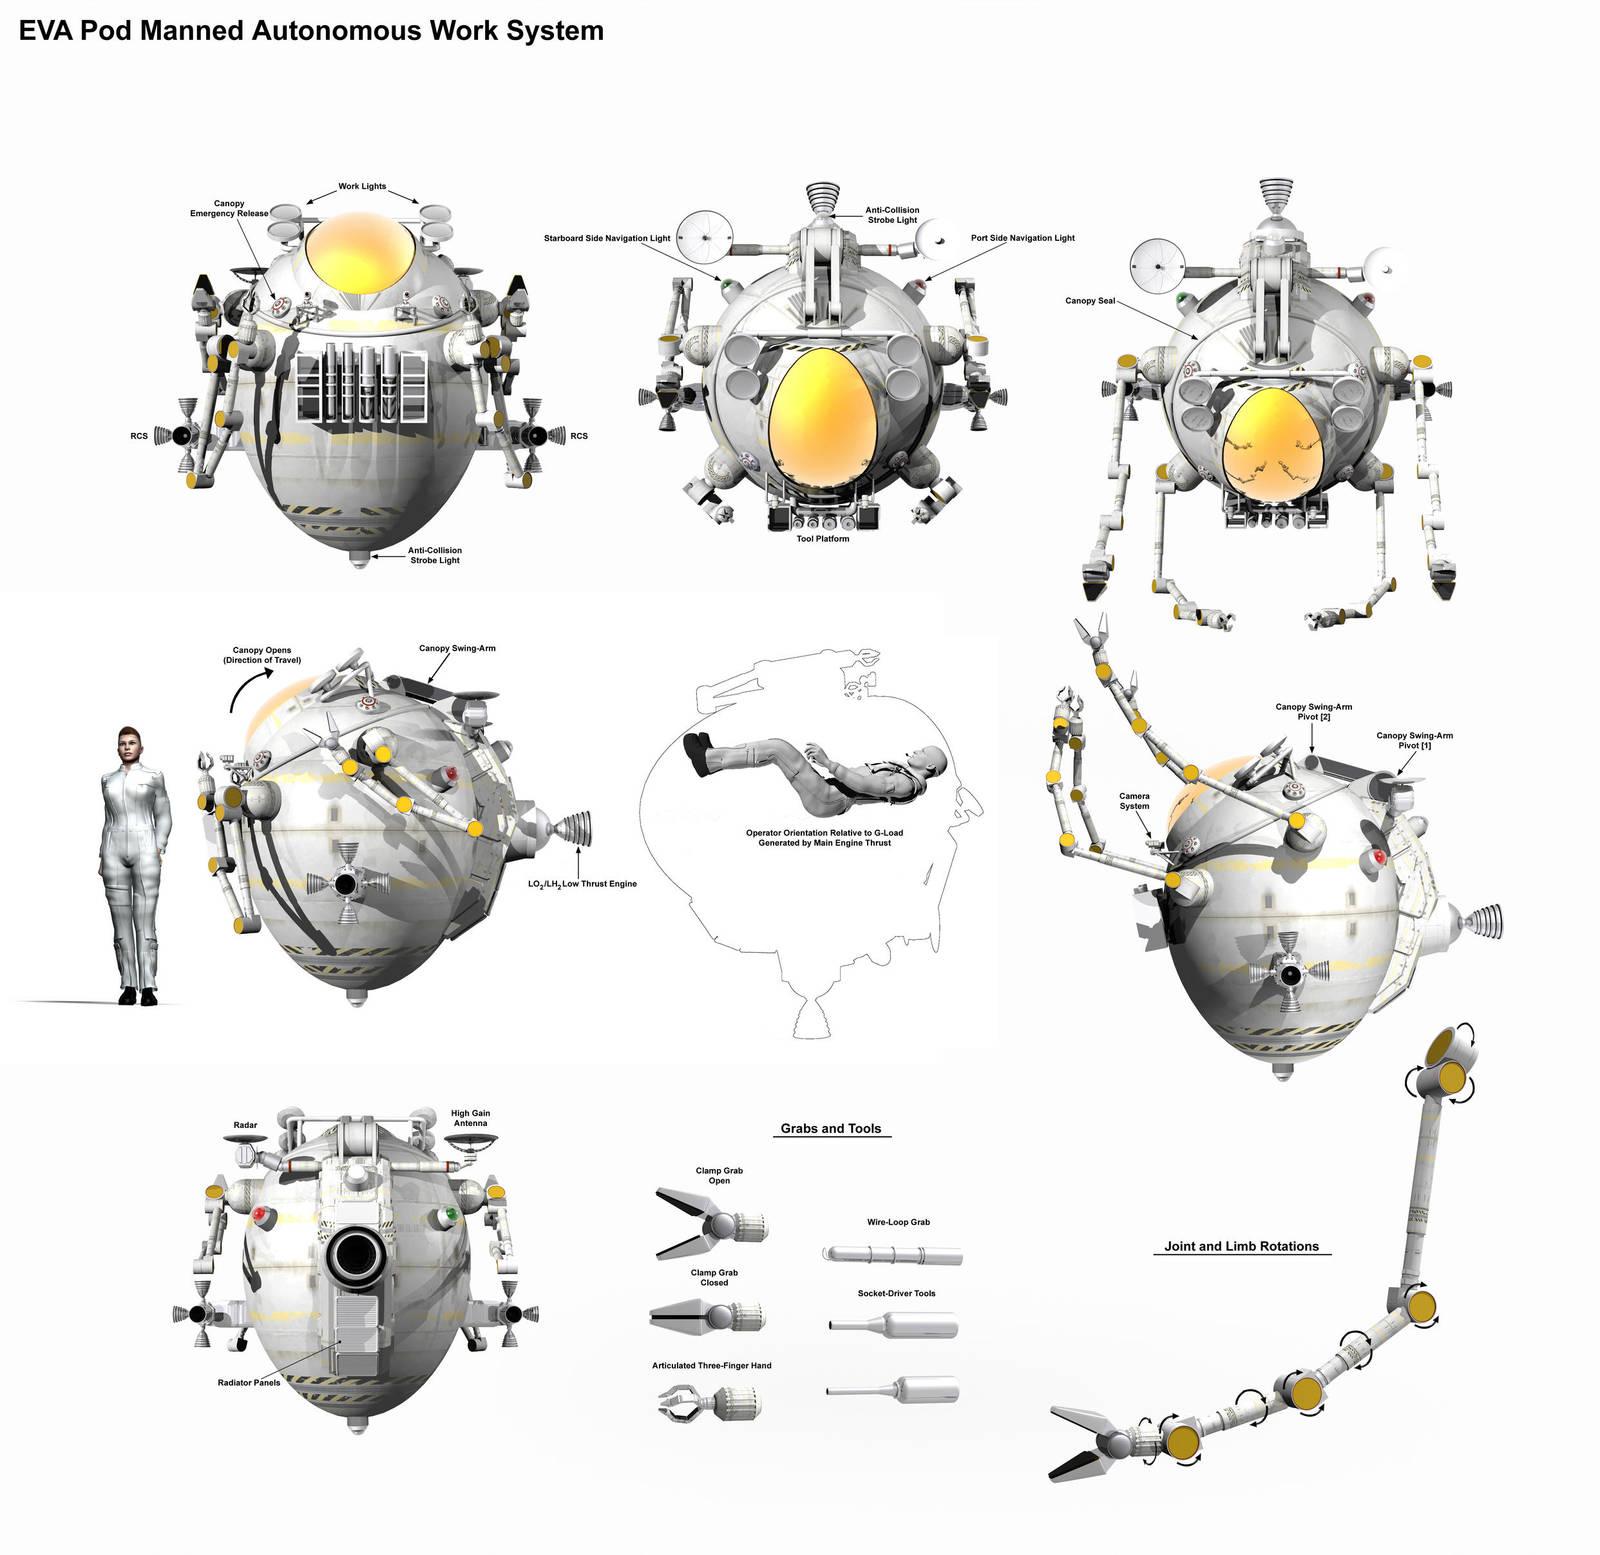 EVA Pod Diagram by William-Black on DeviantArt